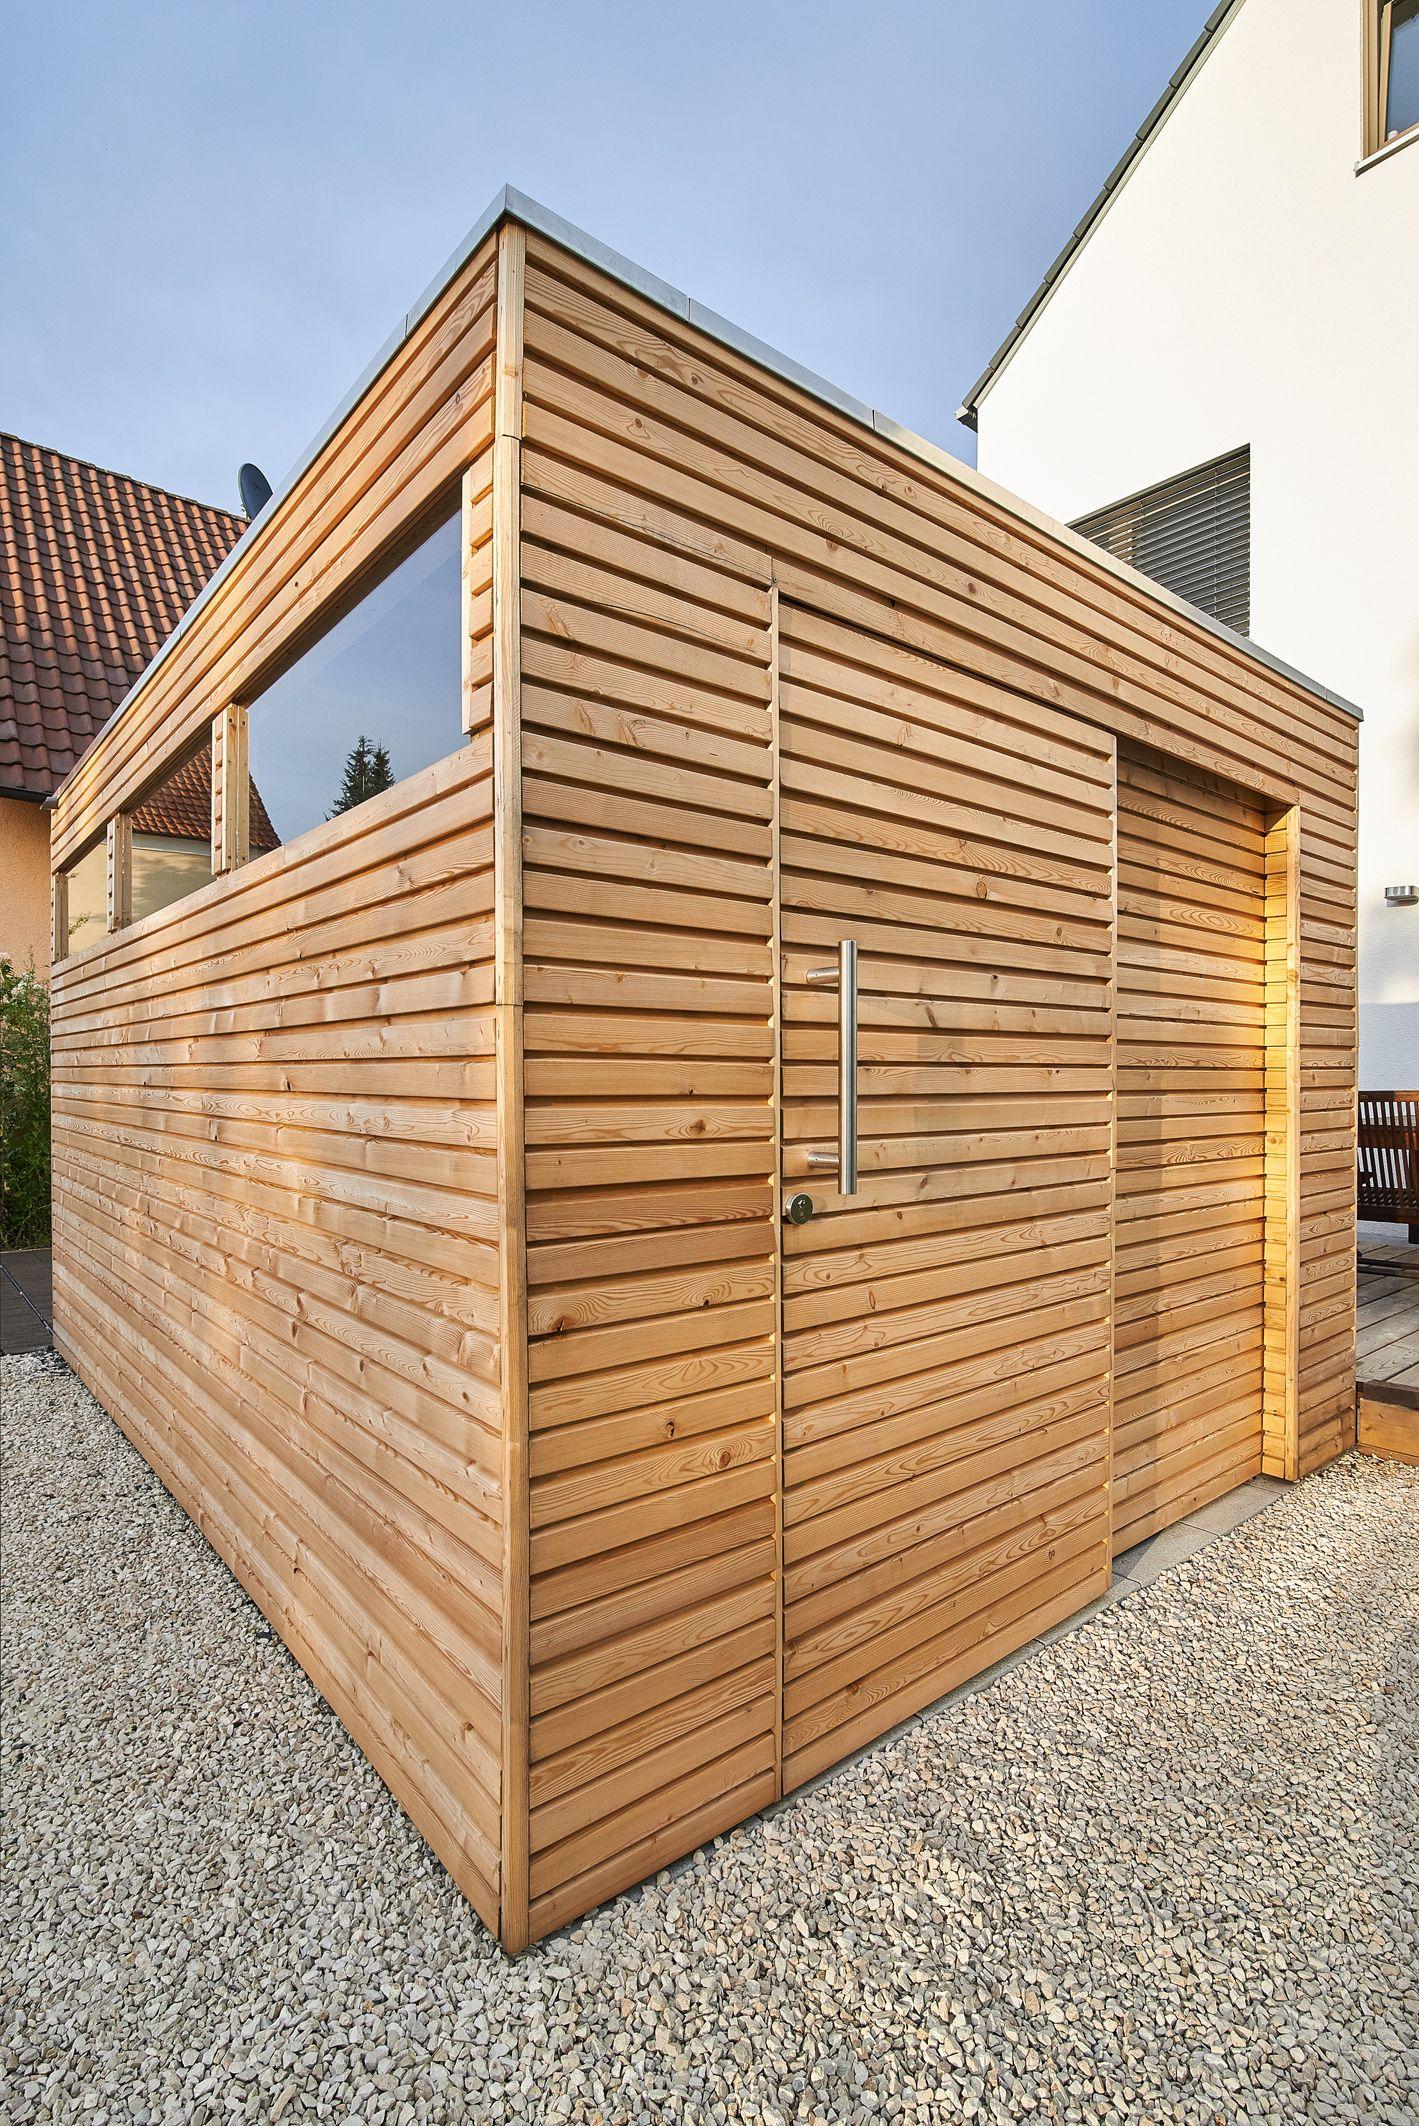 gartenhaus osb platten selber bauen ostseesuche com. Black Bedroom Furniture Sets. Home Design Ideas